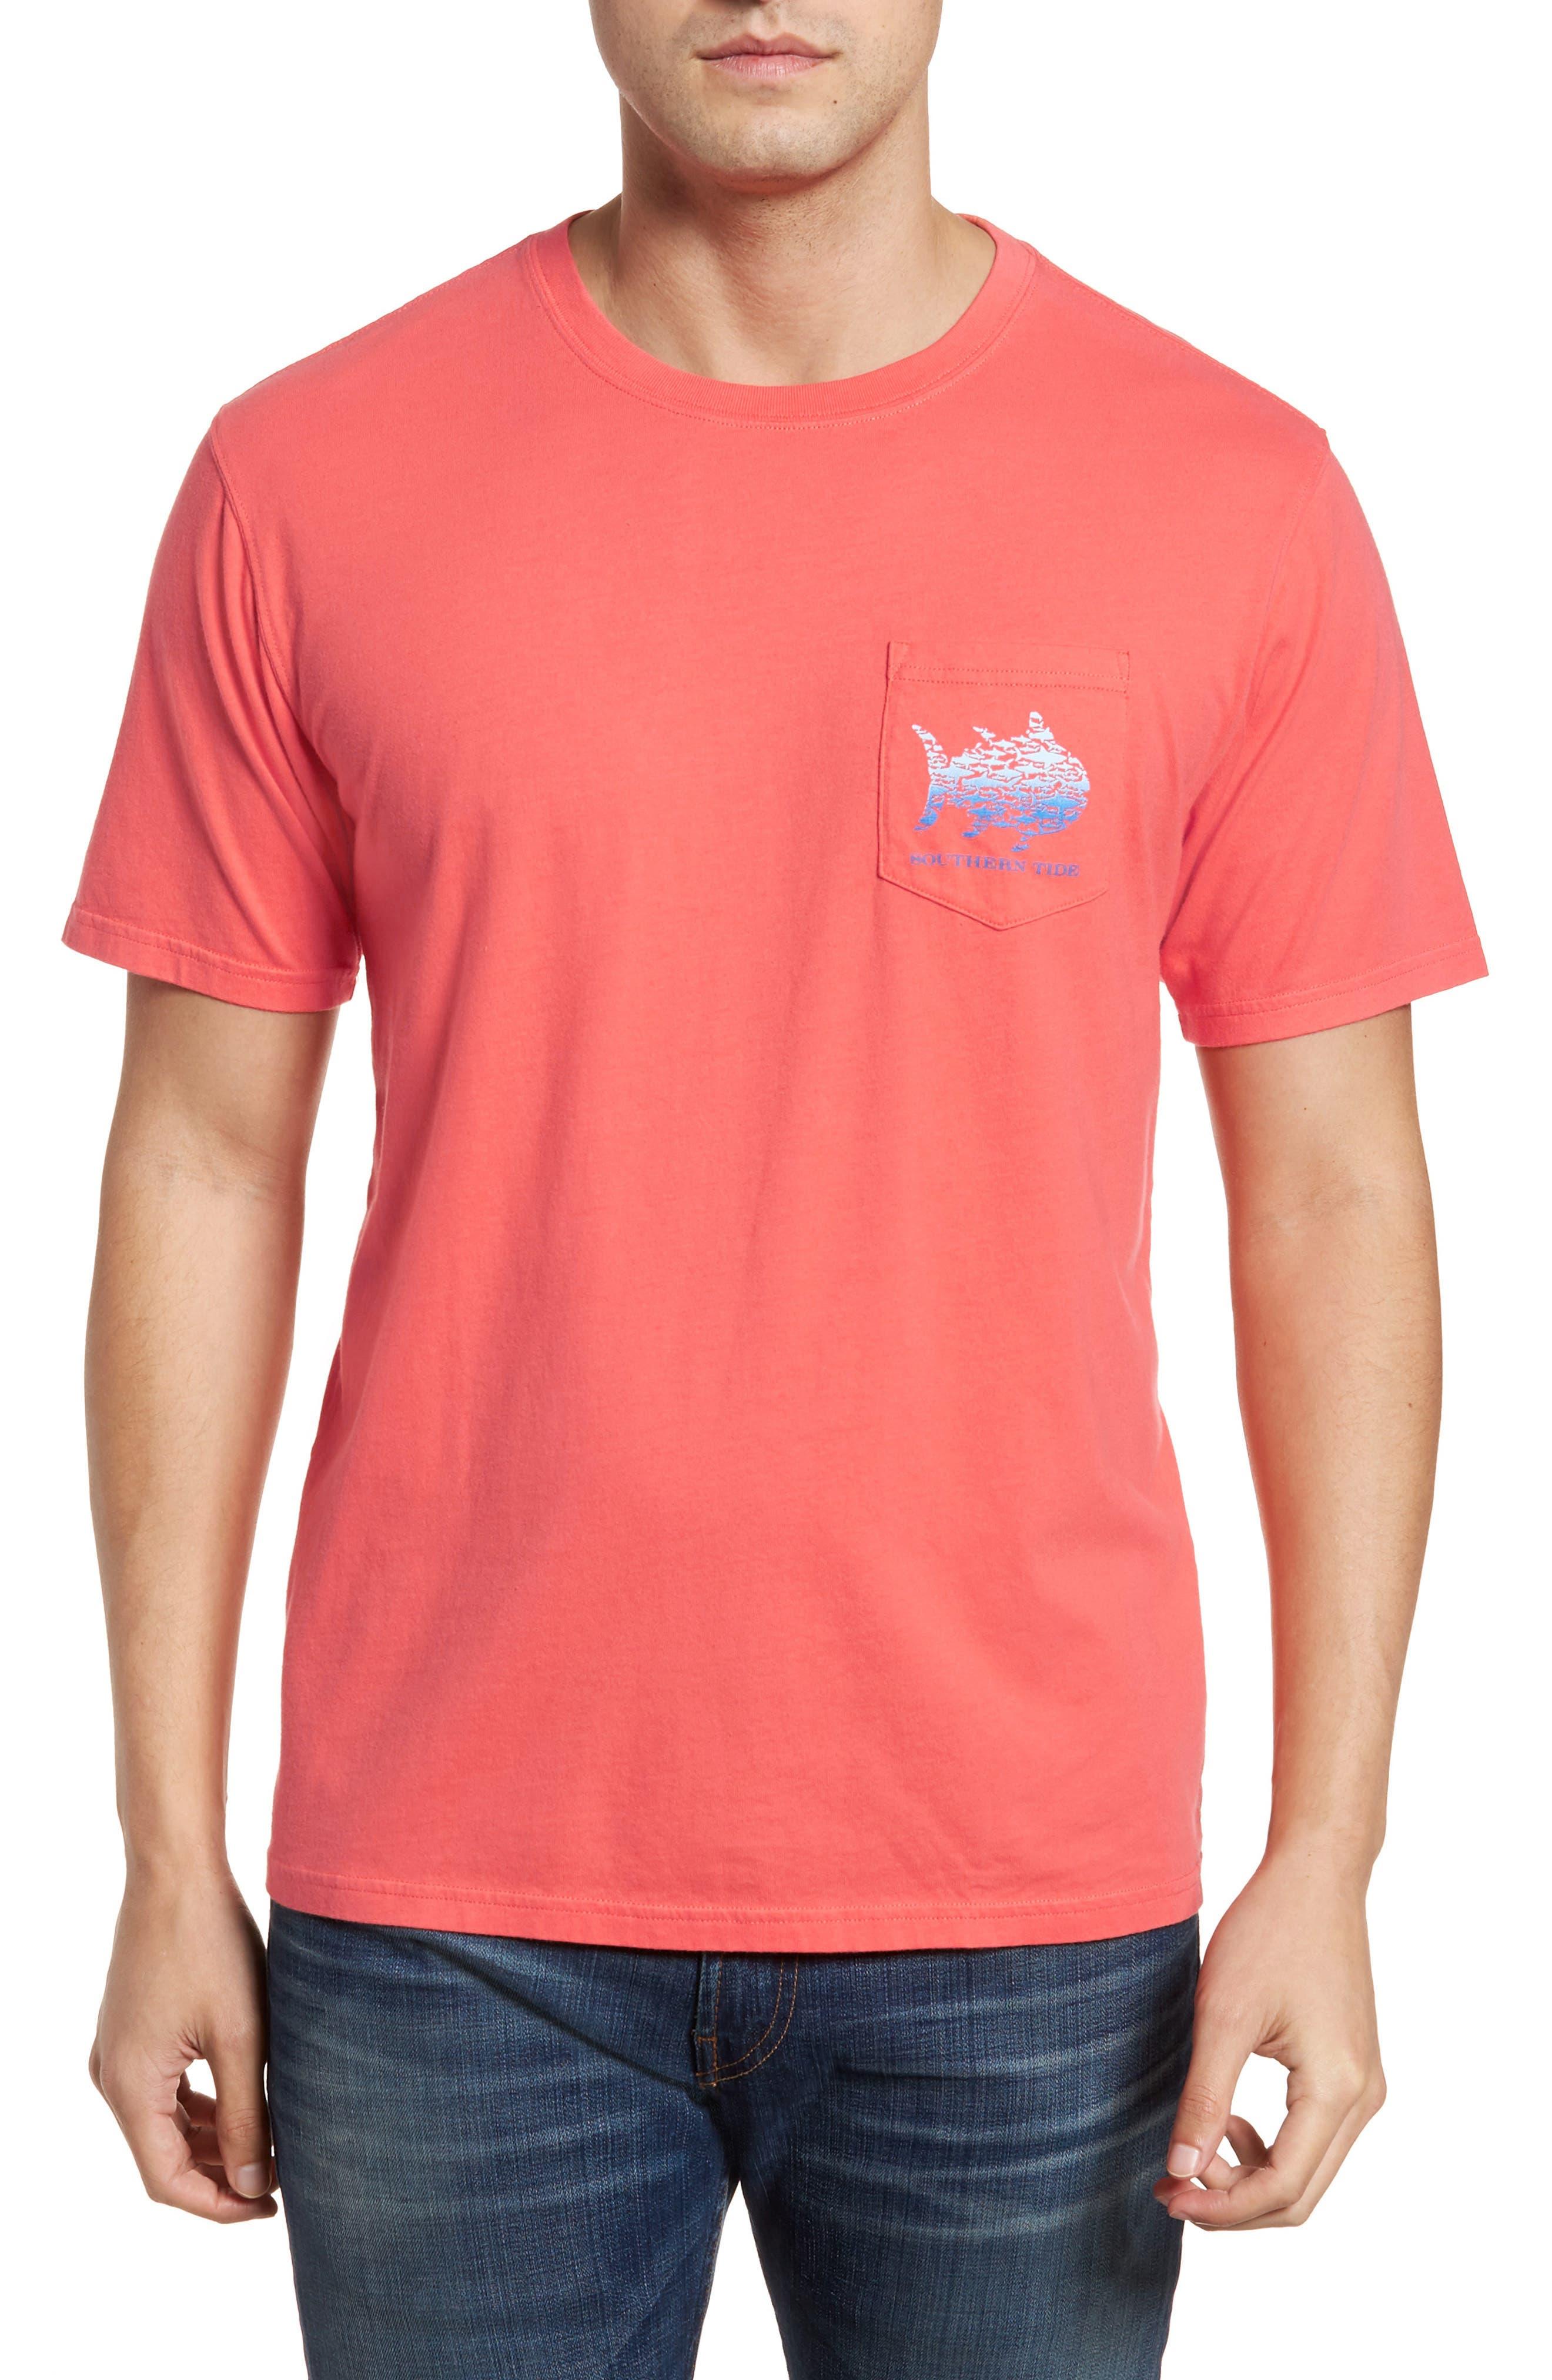 School Of Sharks Crewneck Cotton T-Shirt,                             Main thumbnail 1, color,                             682